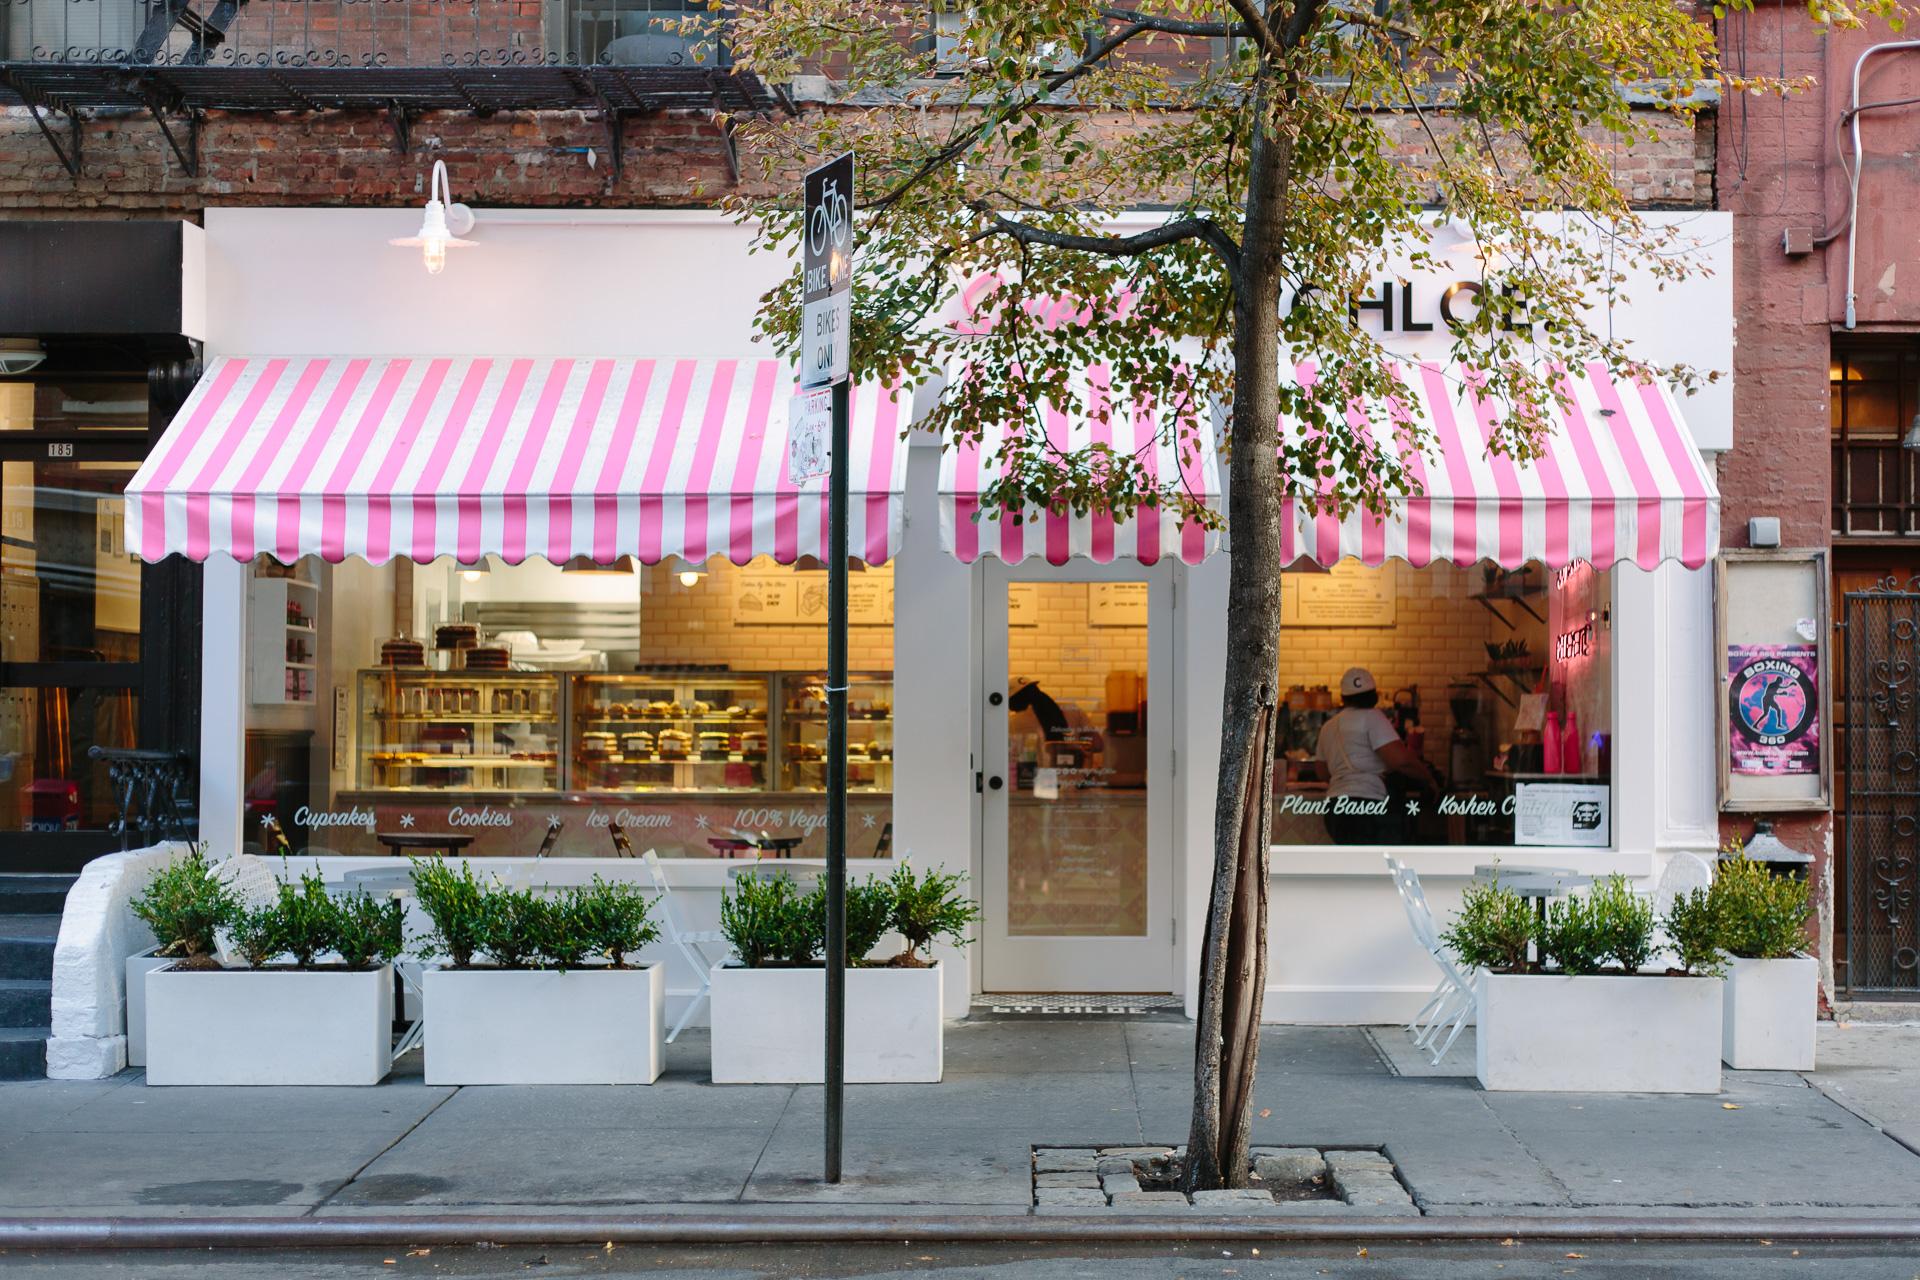 Sweets by Chloe vegan bakery in New York City